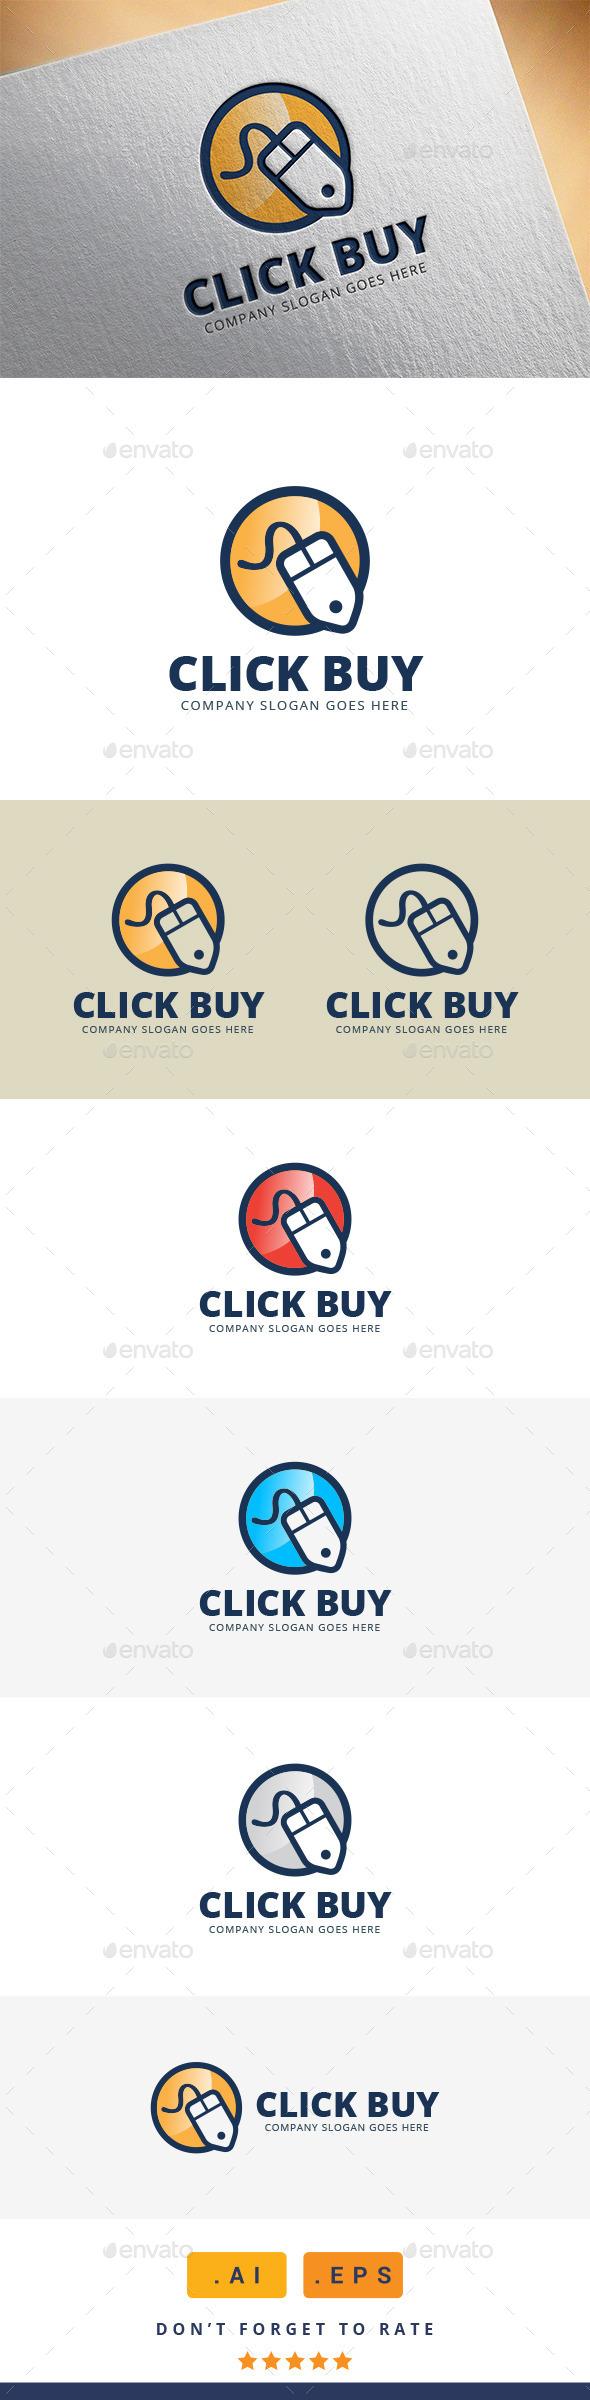 GraphicRiver Click Buy Logo 11370352